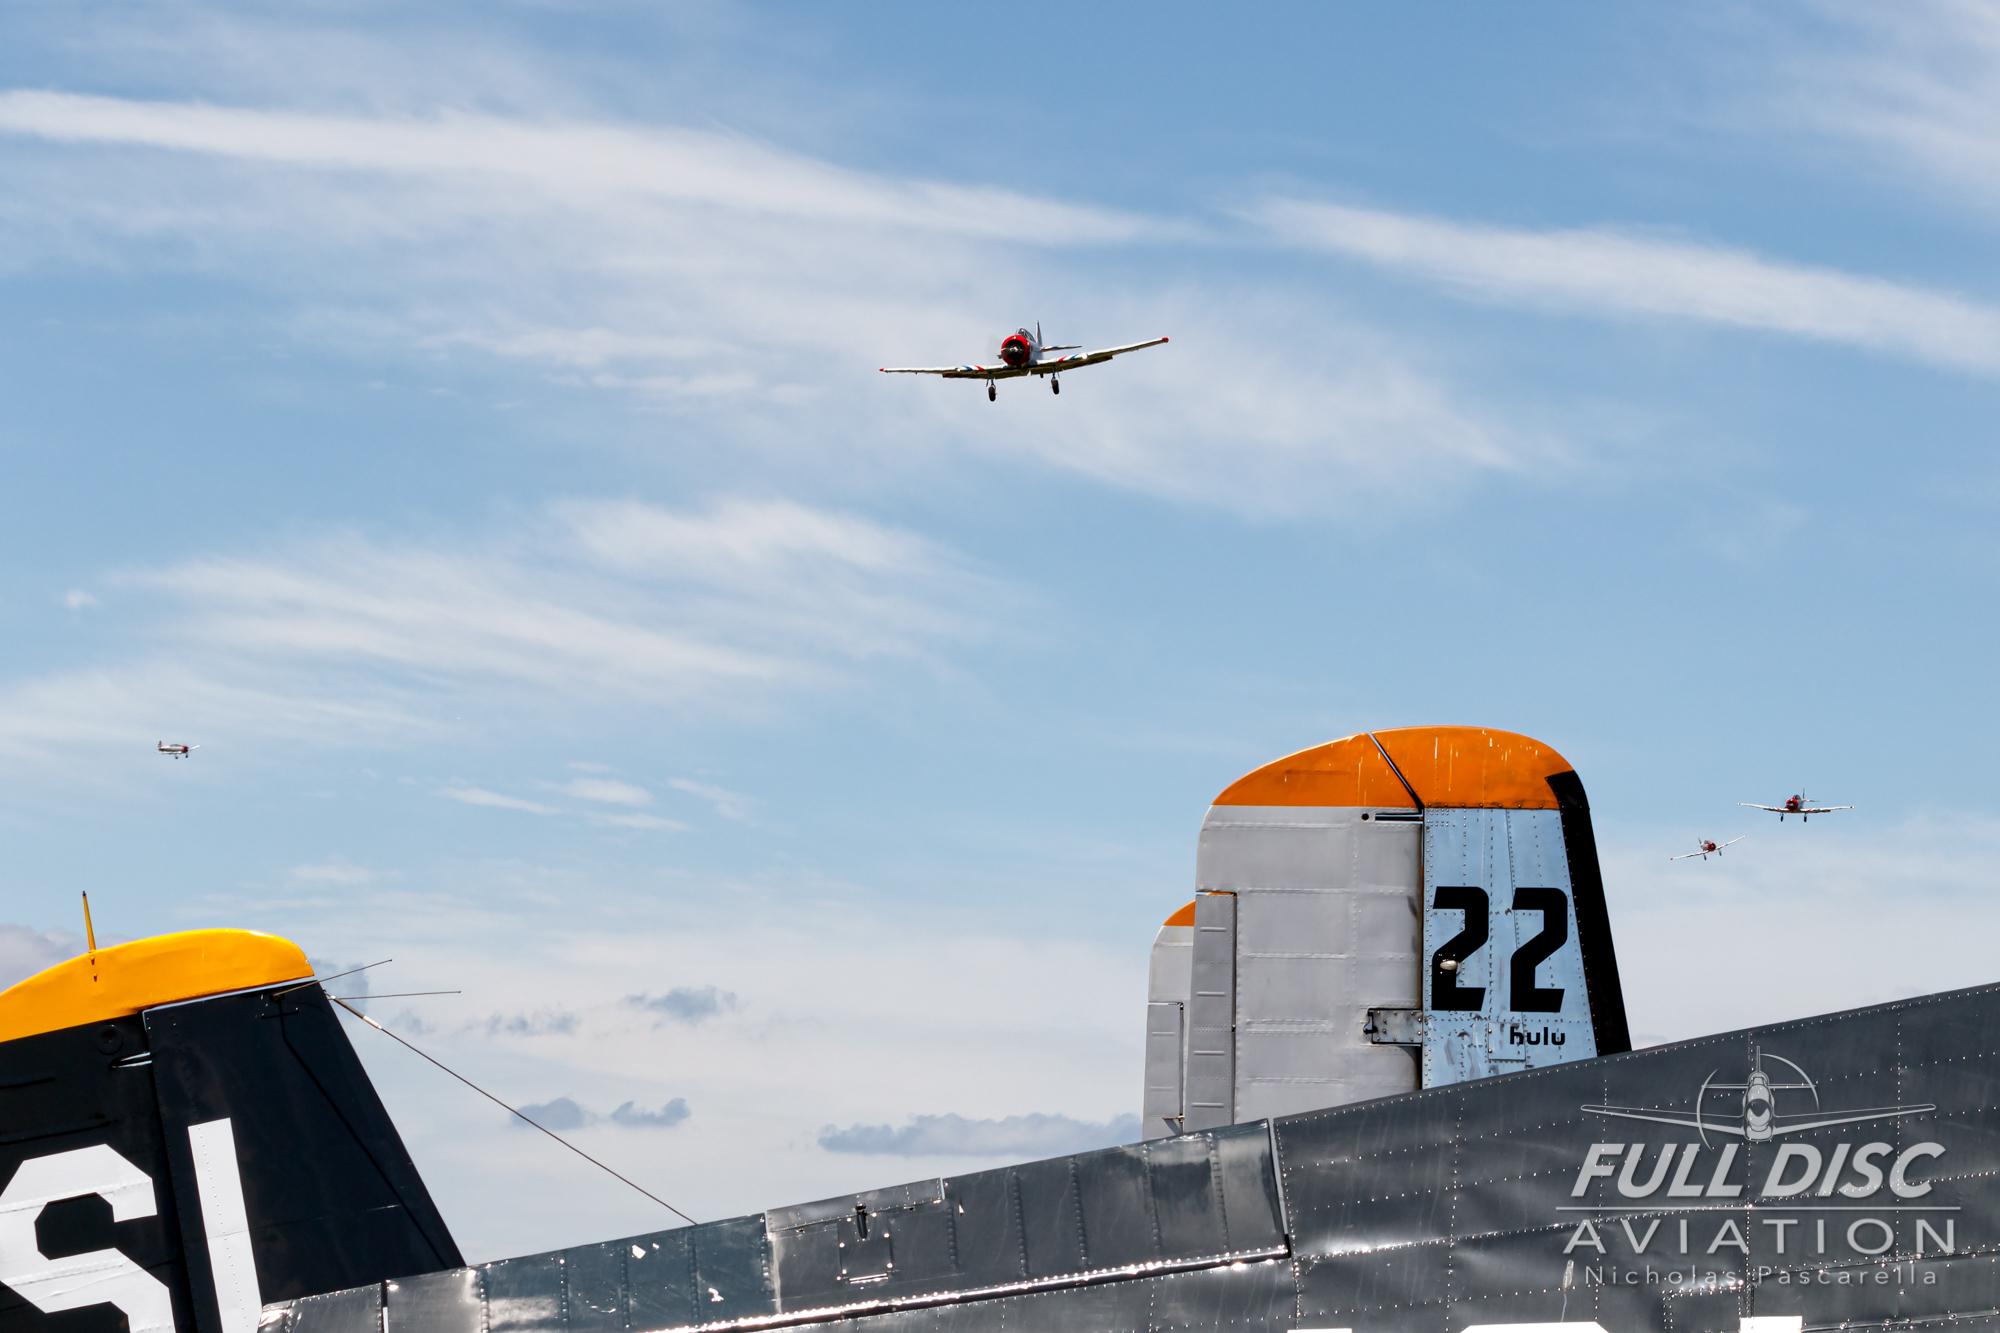 americanairpowermuseum_nicholaspascarella_nickpascarella_fulldiscaviation_legendsofairpower2019_aviation_warbird_skytypers_pattern_t6texan.jpg